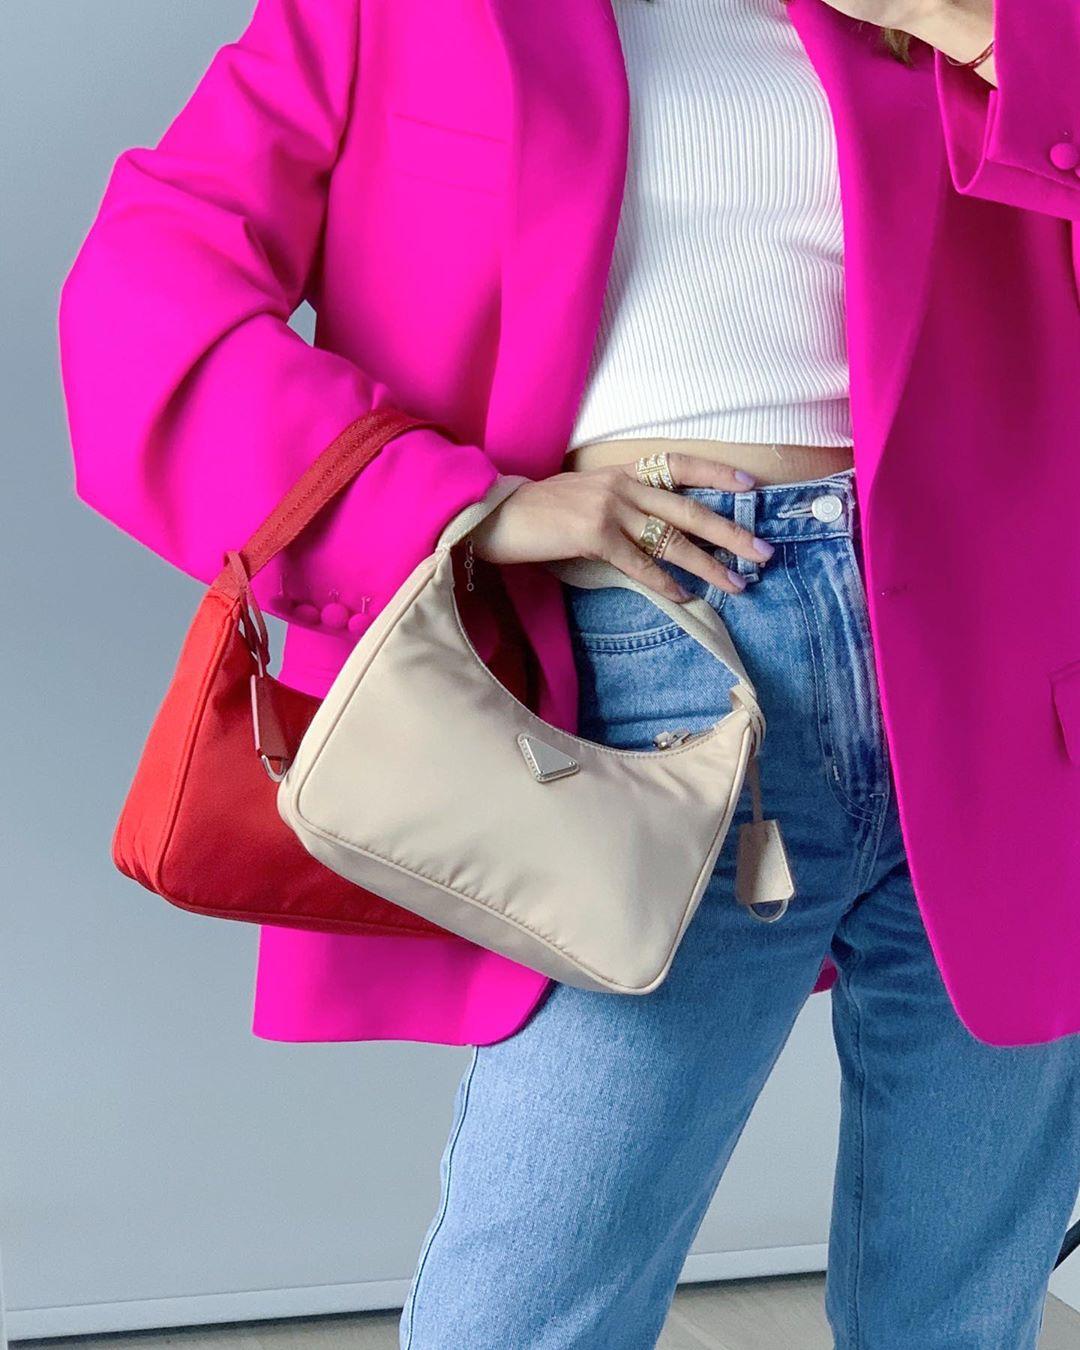 Top 5: Αυτές είναι οι μόνες designer τσάντες που κρατούν οι influencers